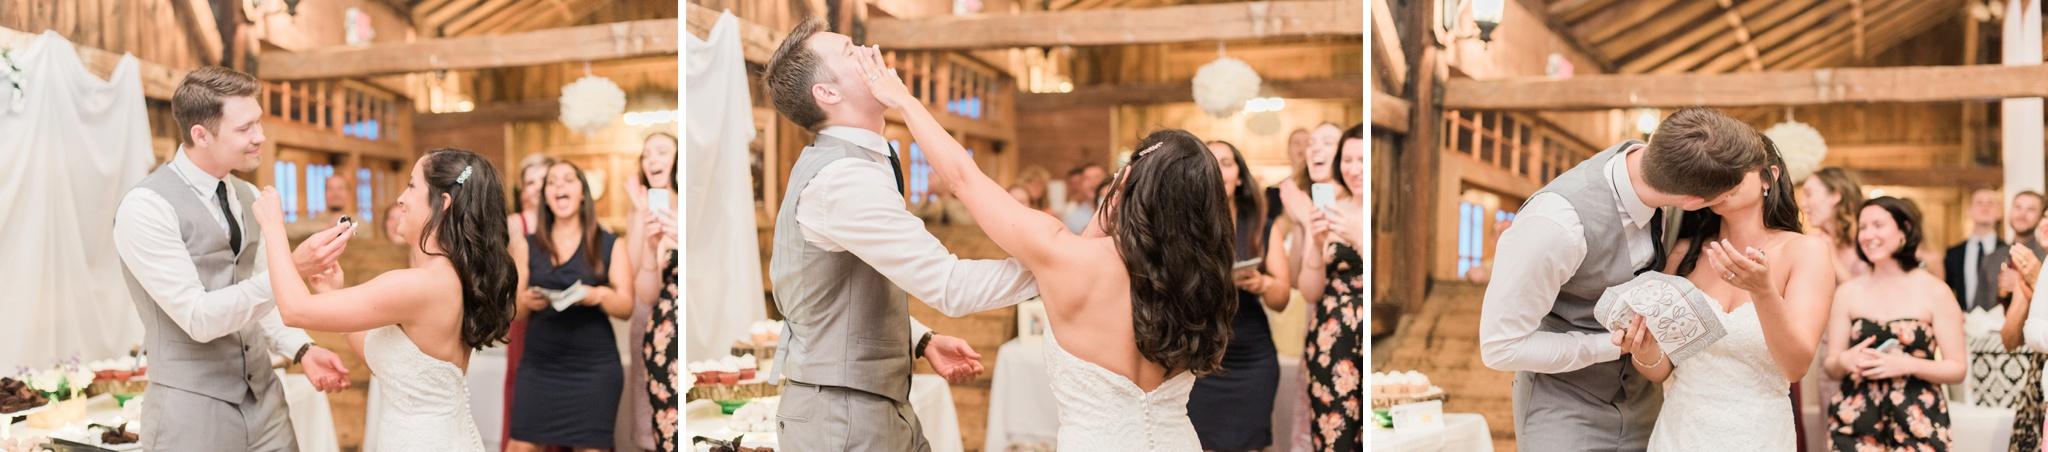 niederman-farm-wedding-cincinnati-ohio-photographer_0102.jpg